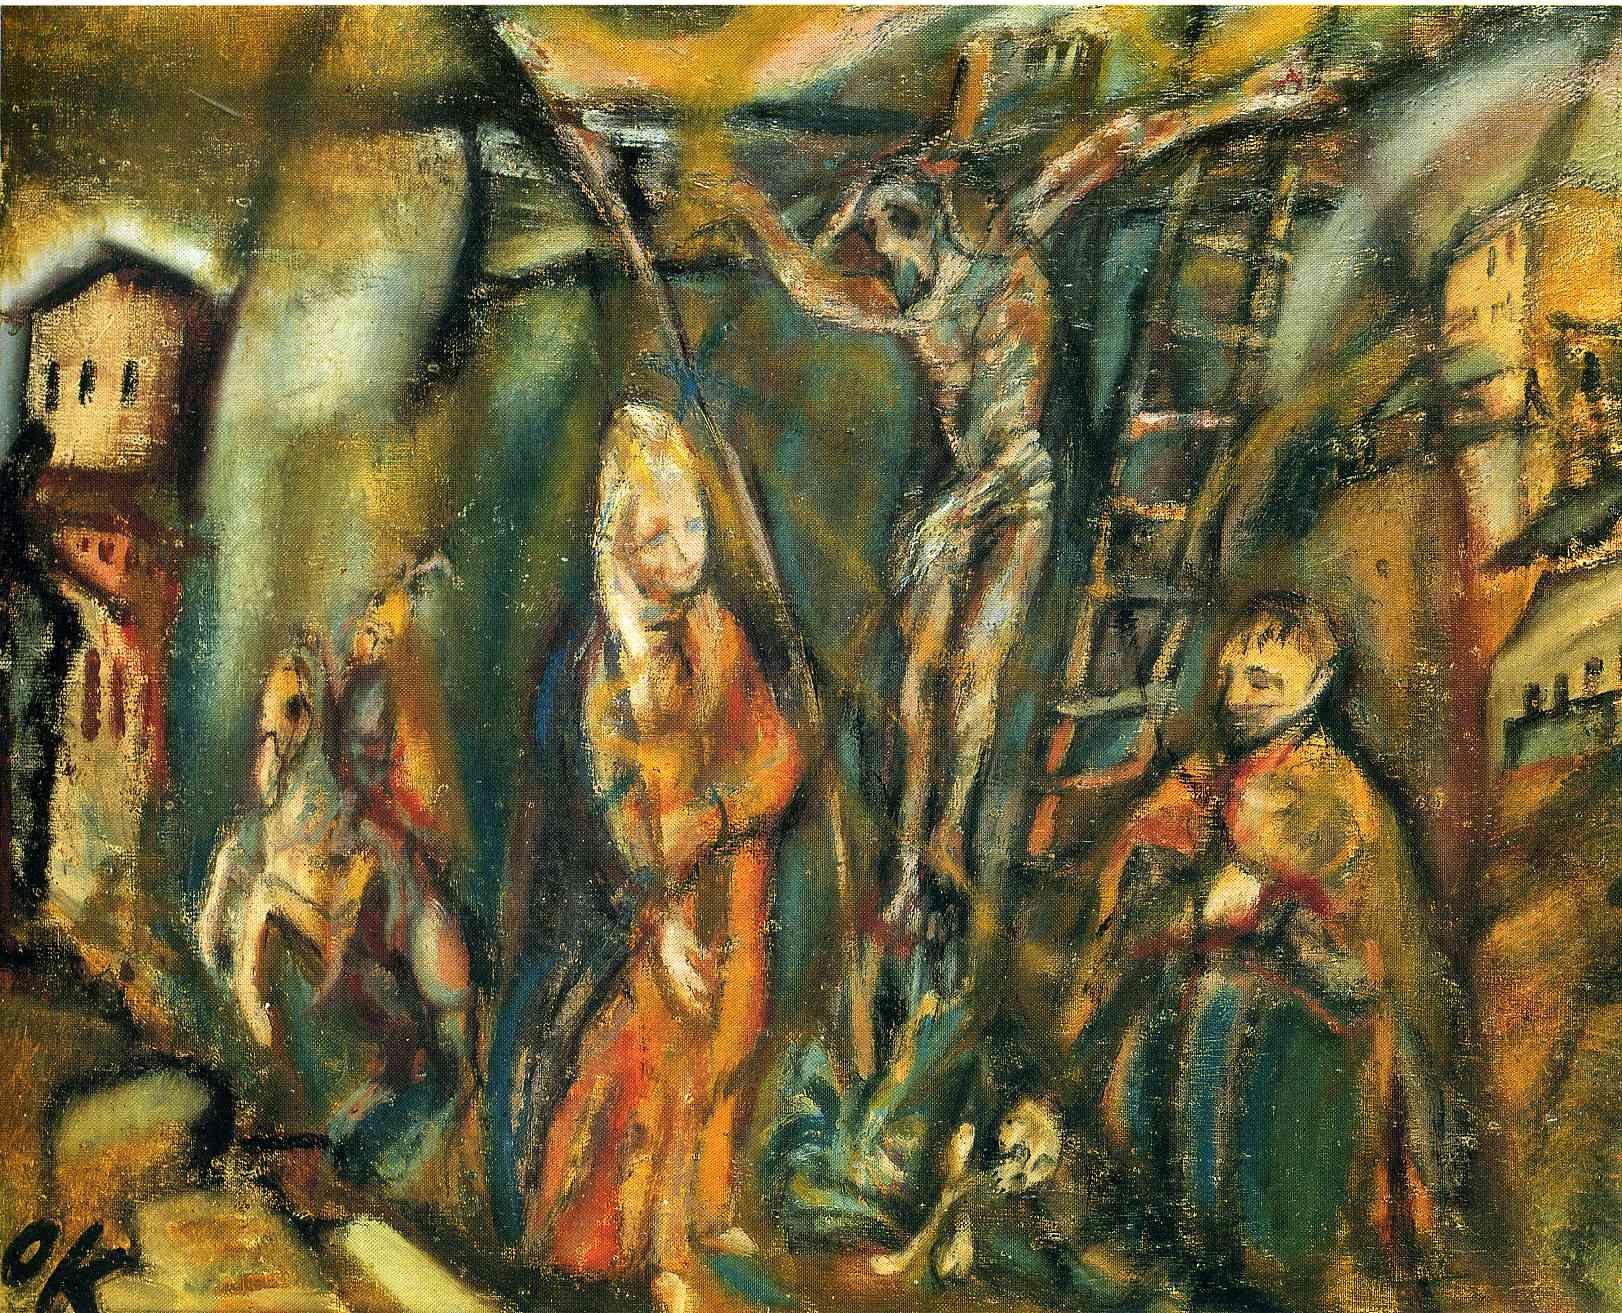 Crucifixion (Golgotha), 1912 - Oskar Kokoschka - WikiArt.org Chagall Crucifixion Paintings